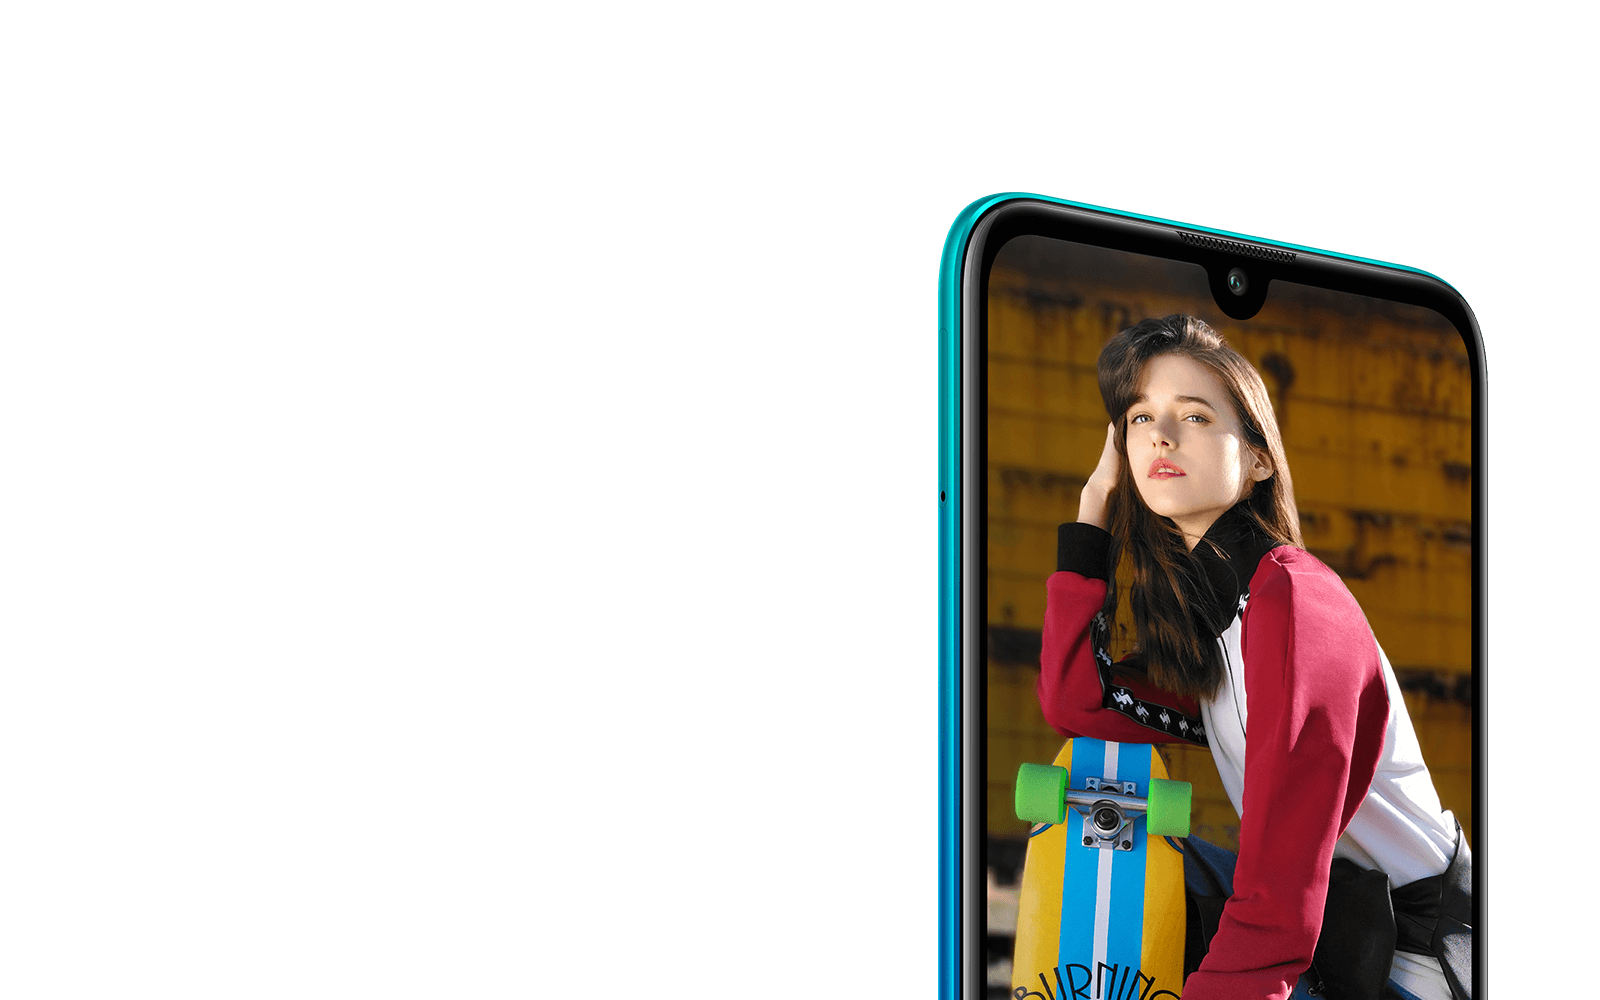 HUAWEI-Y7-Prime-2019-rear-camera